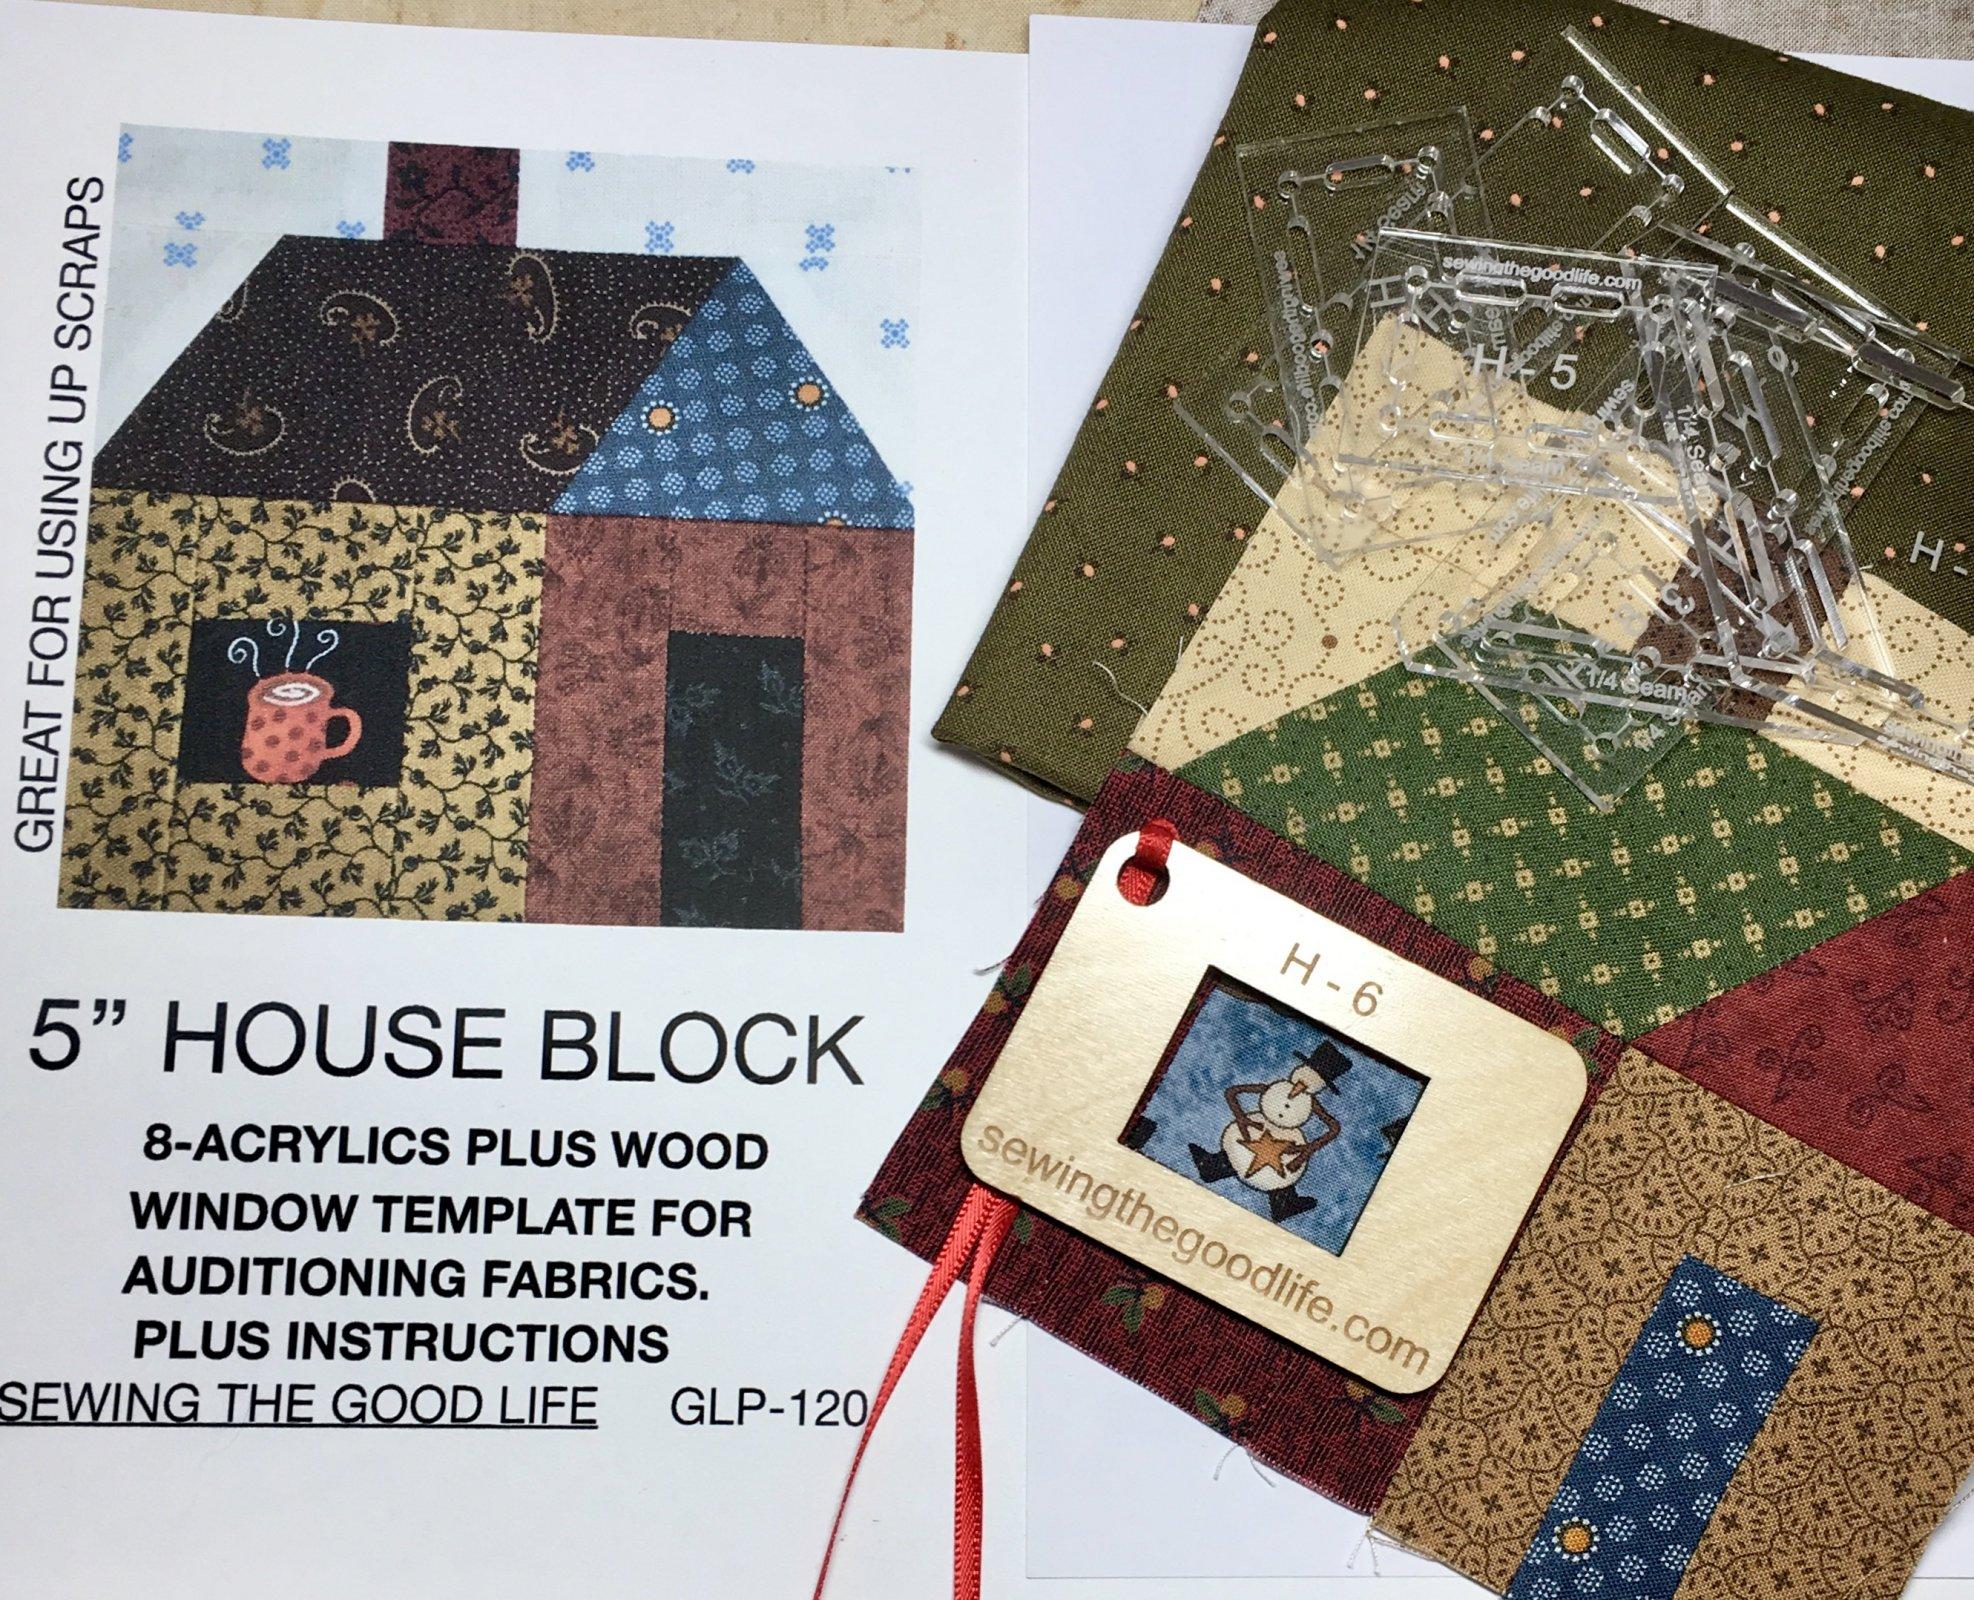 5 HOUSE BLOCK GLPT-120